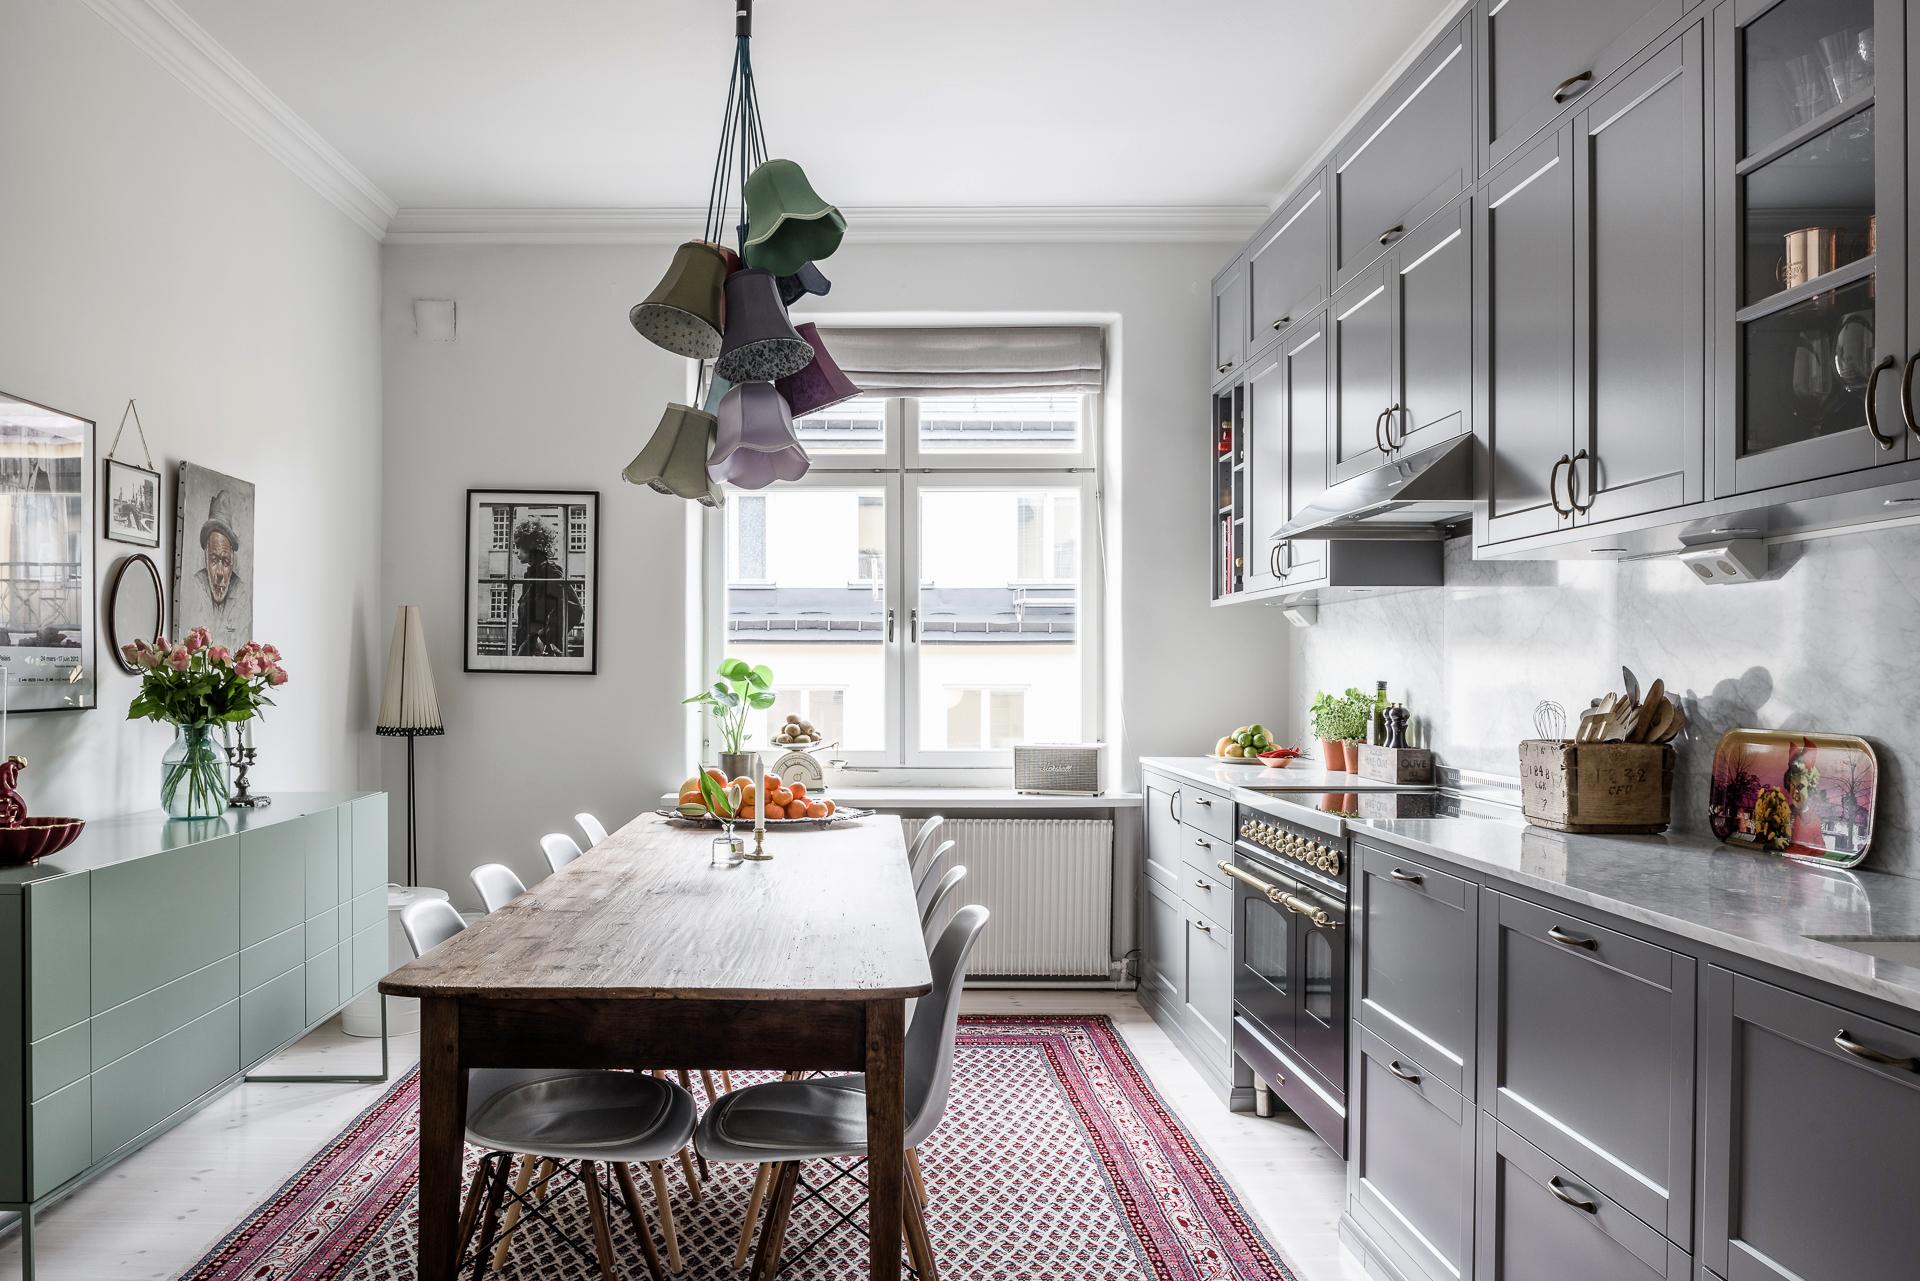 кухня мебель серые фасады стол комод ковер